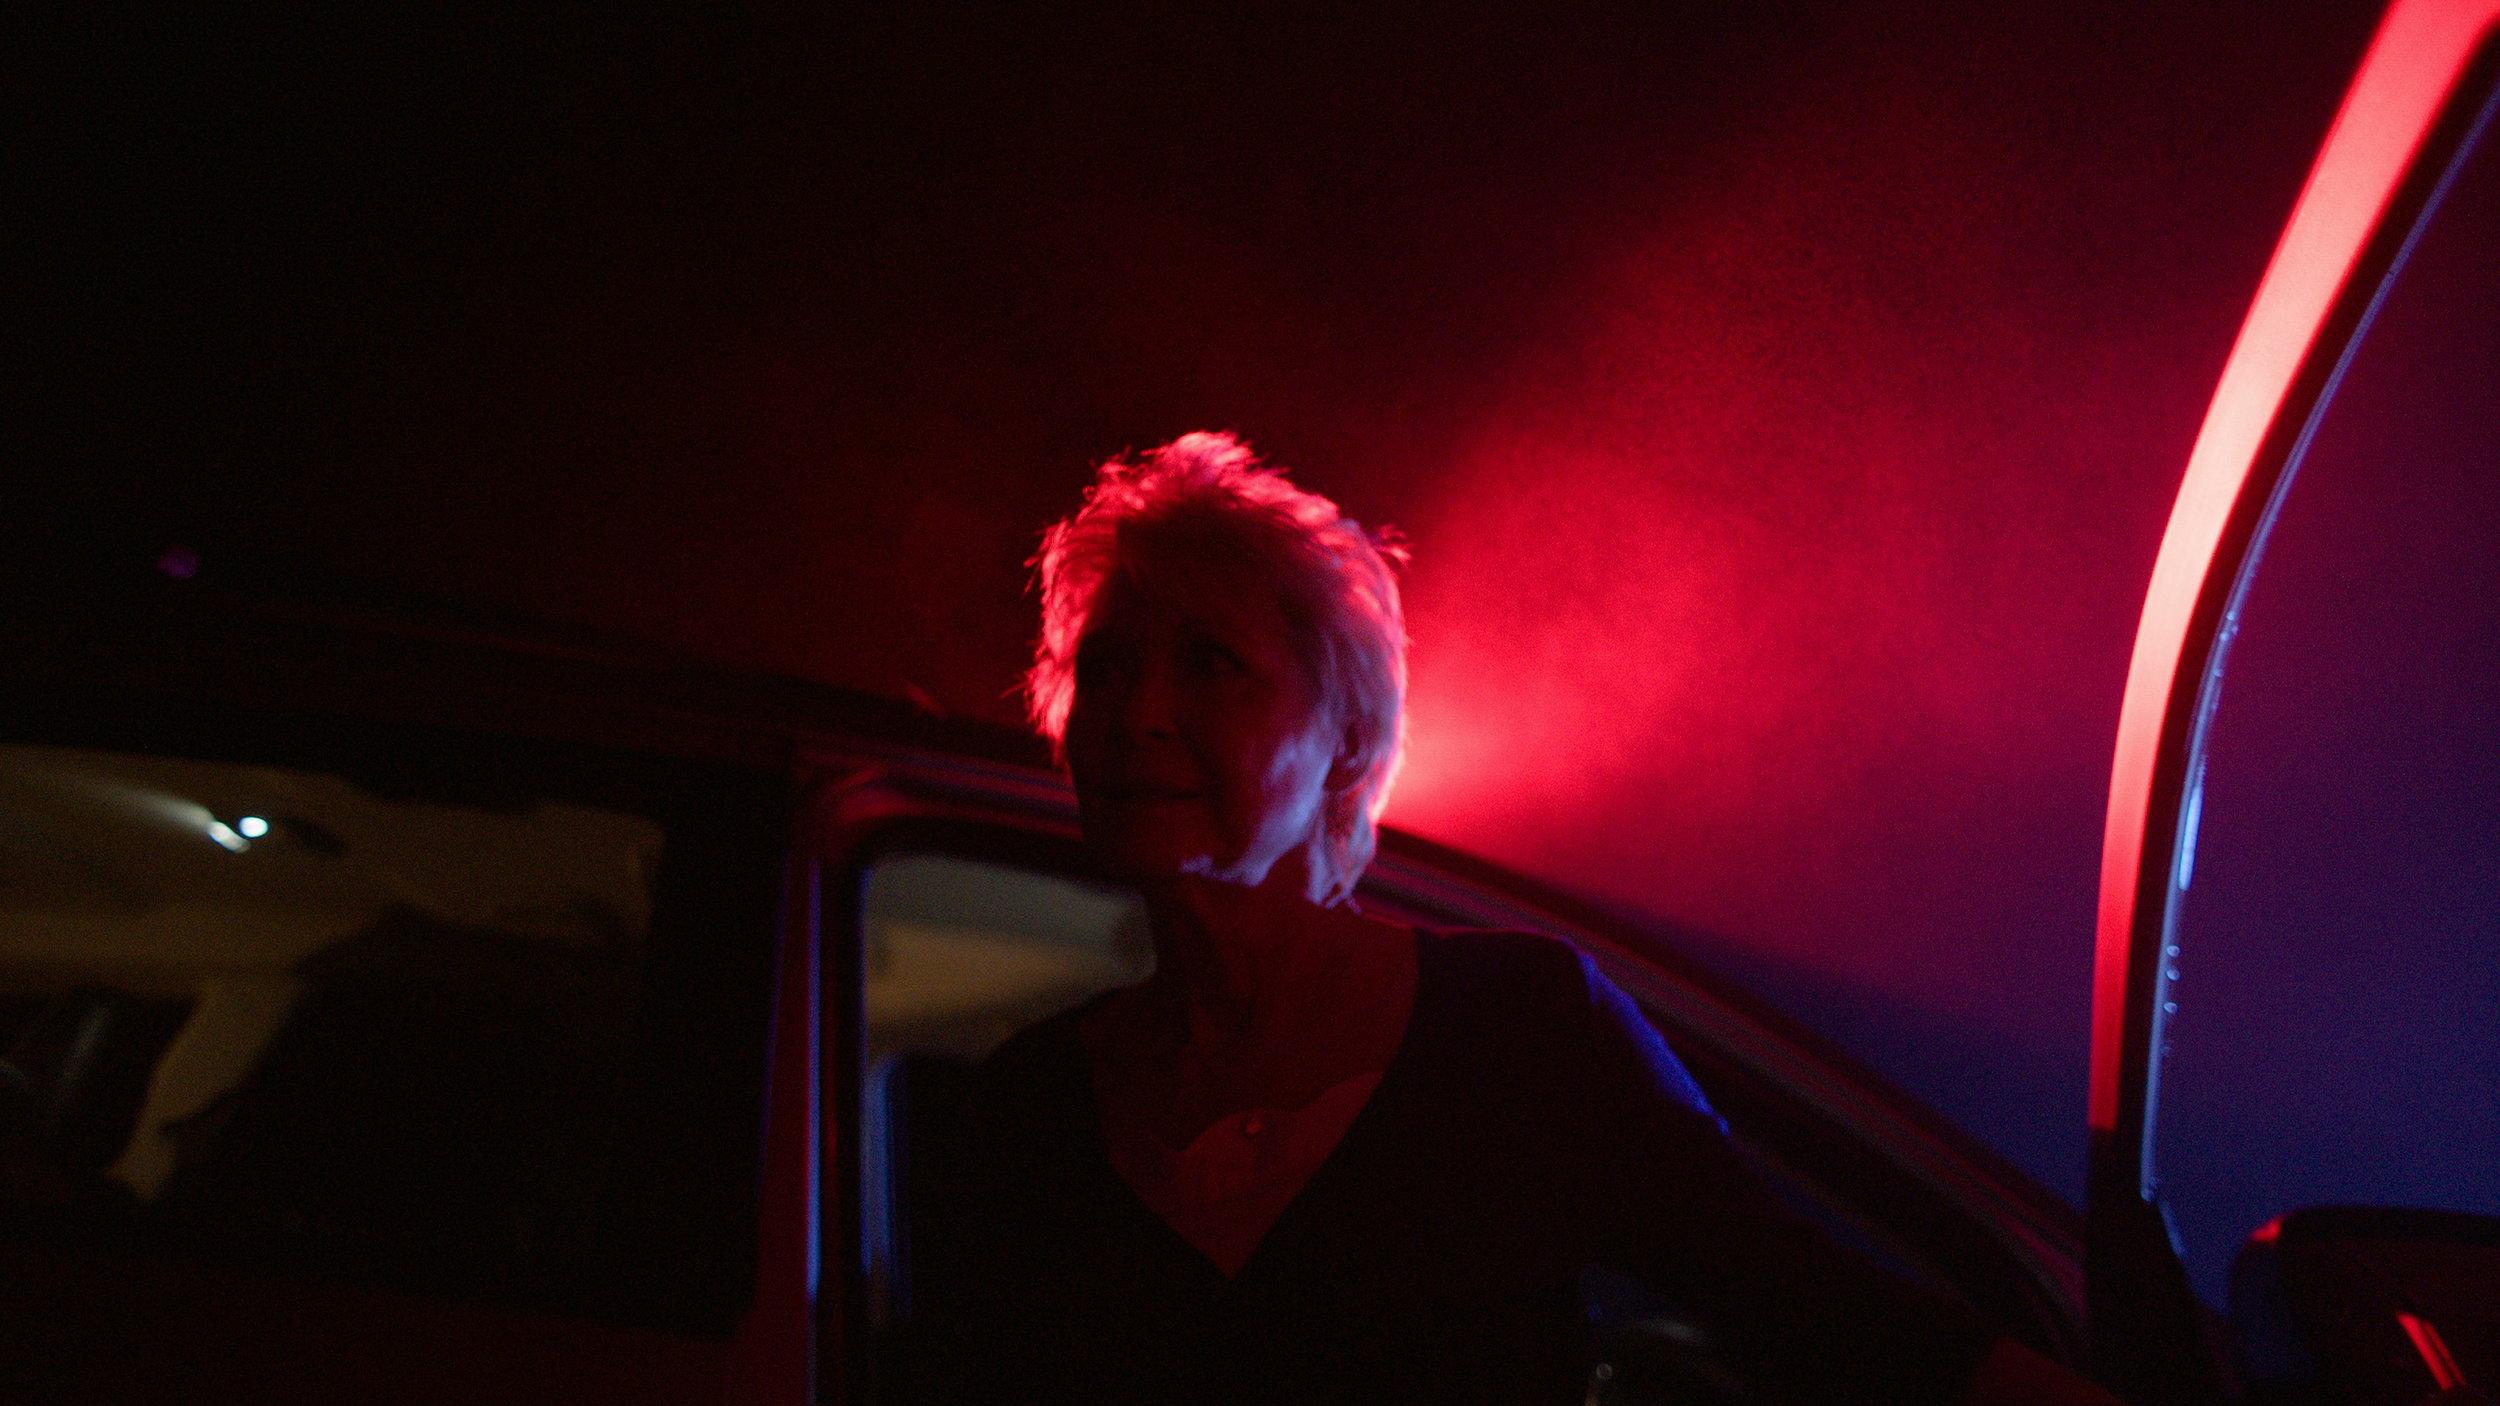 Dee Wallace Police Light - Red Christmas Photo by Douglas Burgdorff.jpeg